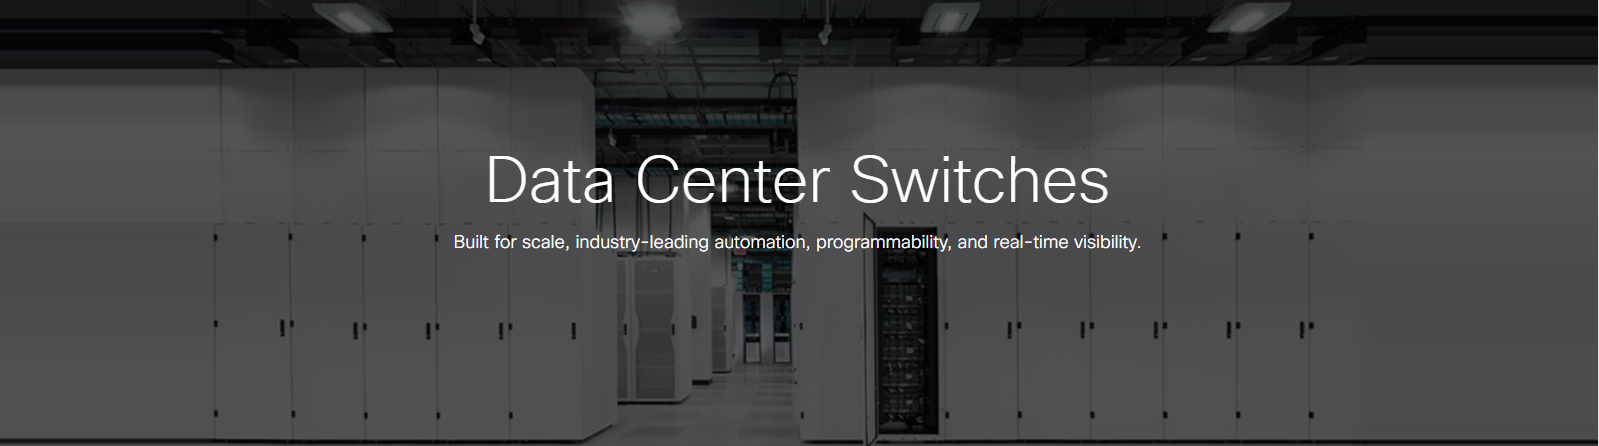 Cisco Data Center Switches | SecureITStore com